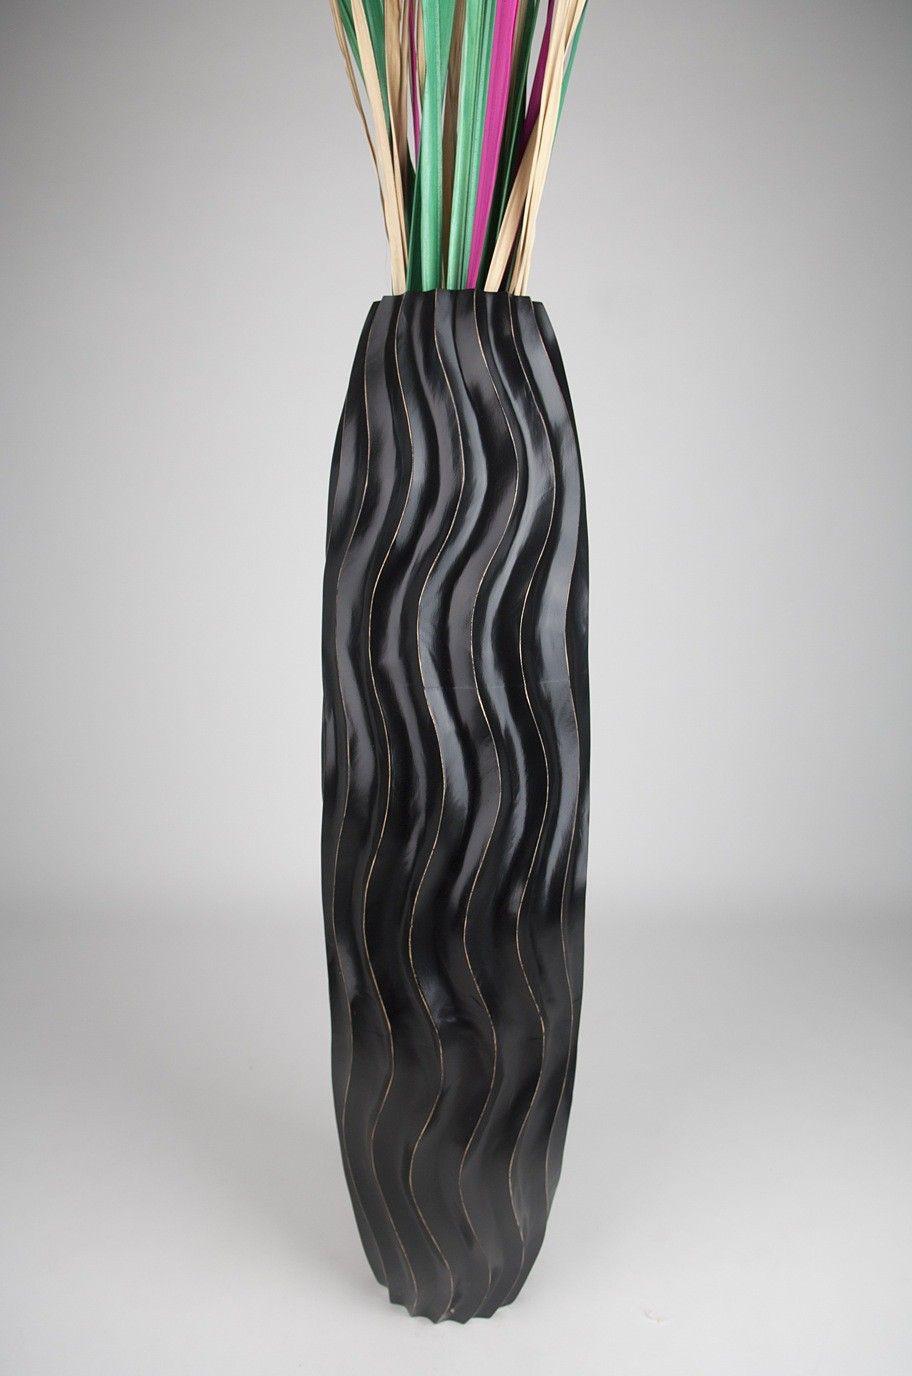 tall slim floor vase of decorative tall floor vase wood height 115cm new home ideas within decorative tall floor vase wood height 115cm